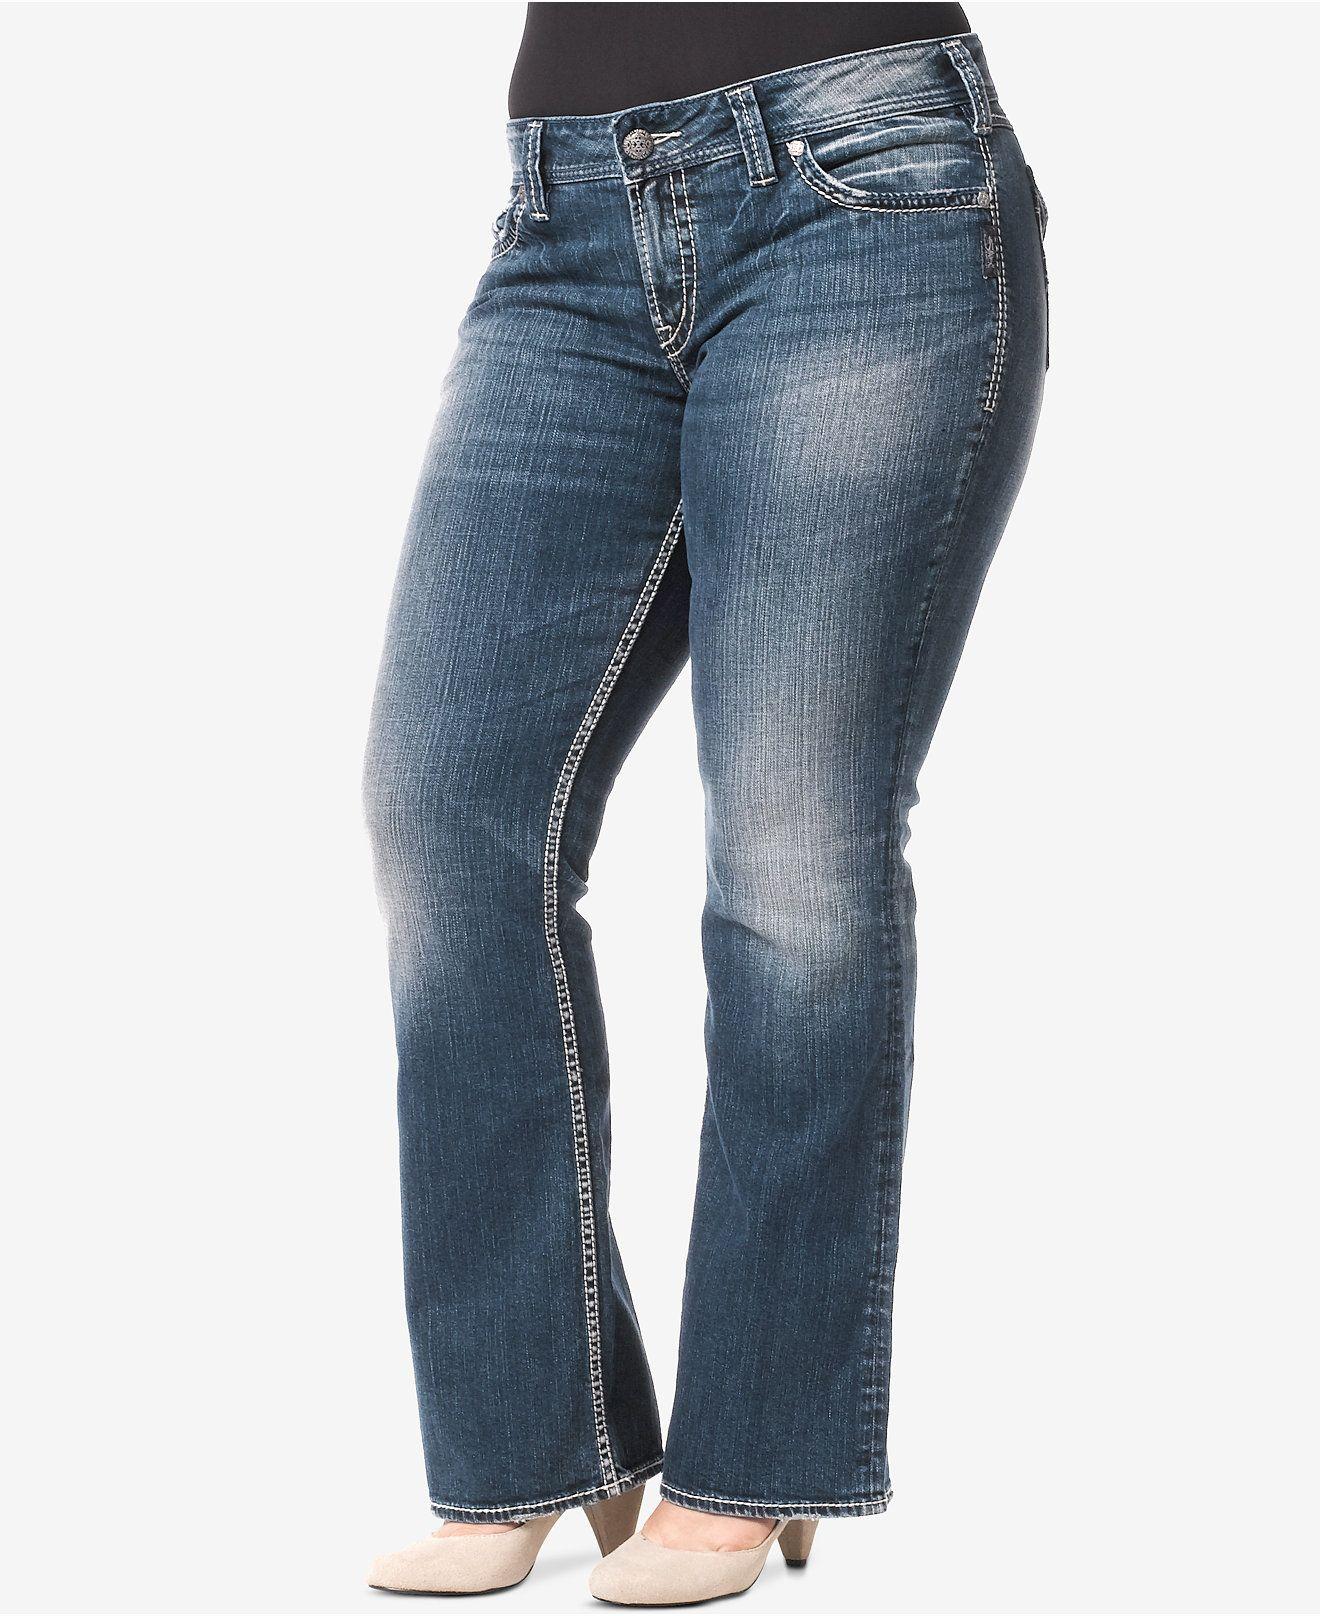 3f3556a92f428 Silver Jeans Plus Size Suki Indigo Wash Bootcut Jeans - Trendy Plus Sizes - Plus  Sizes - Macy s